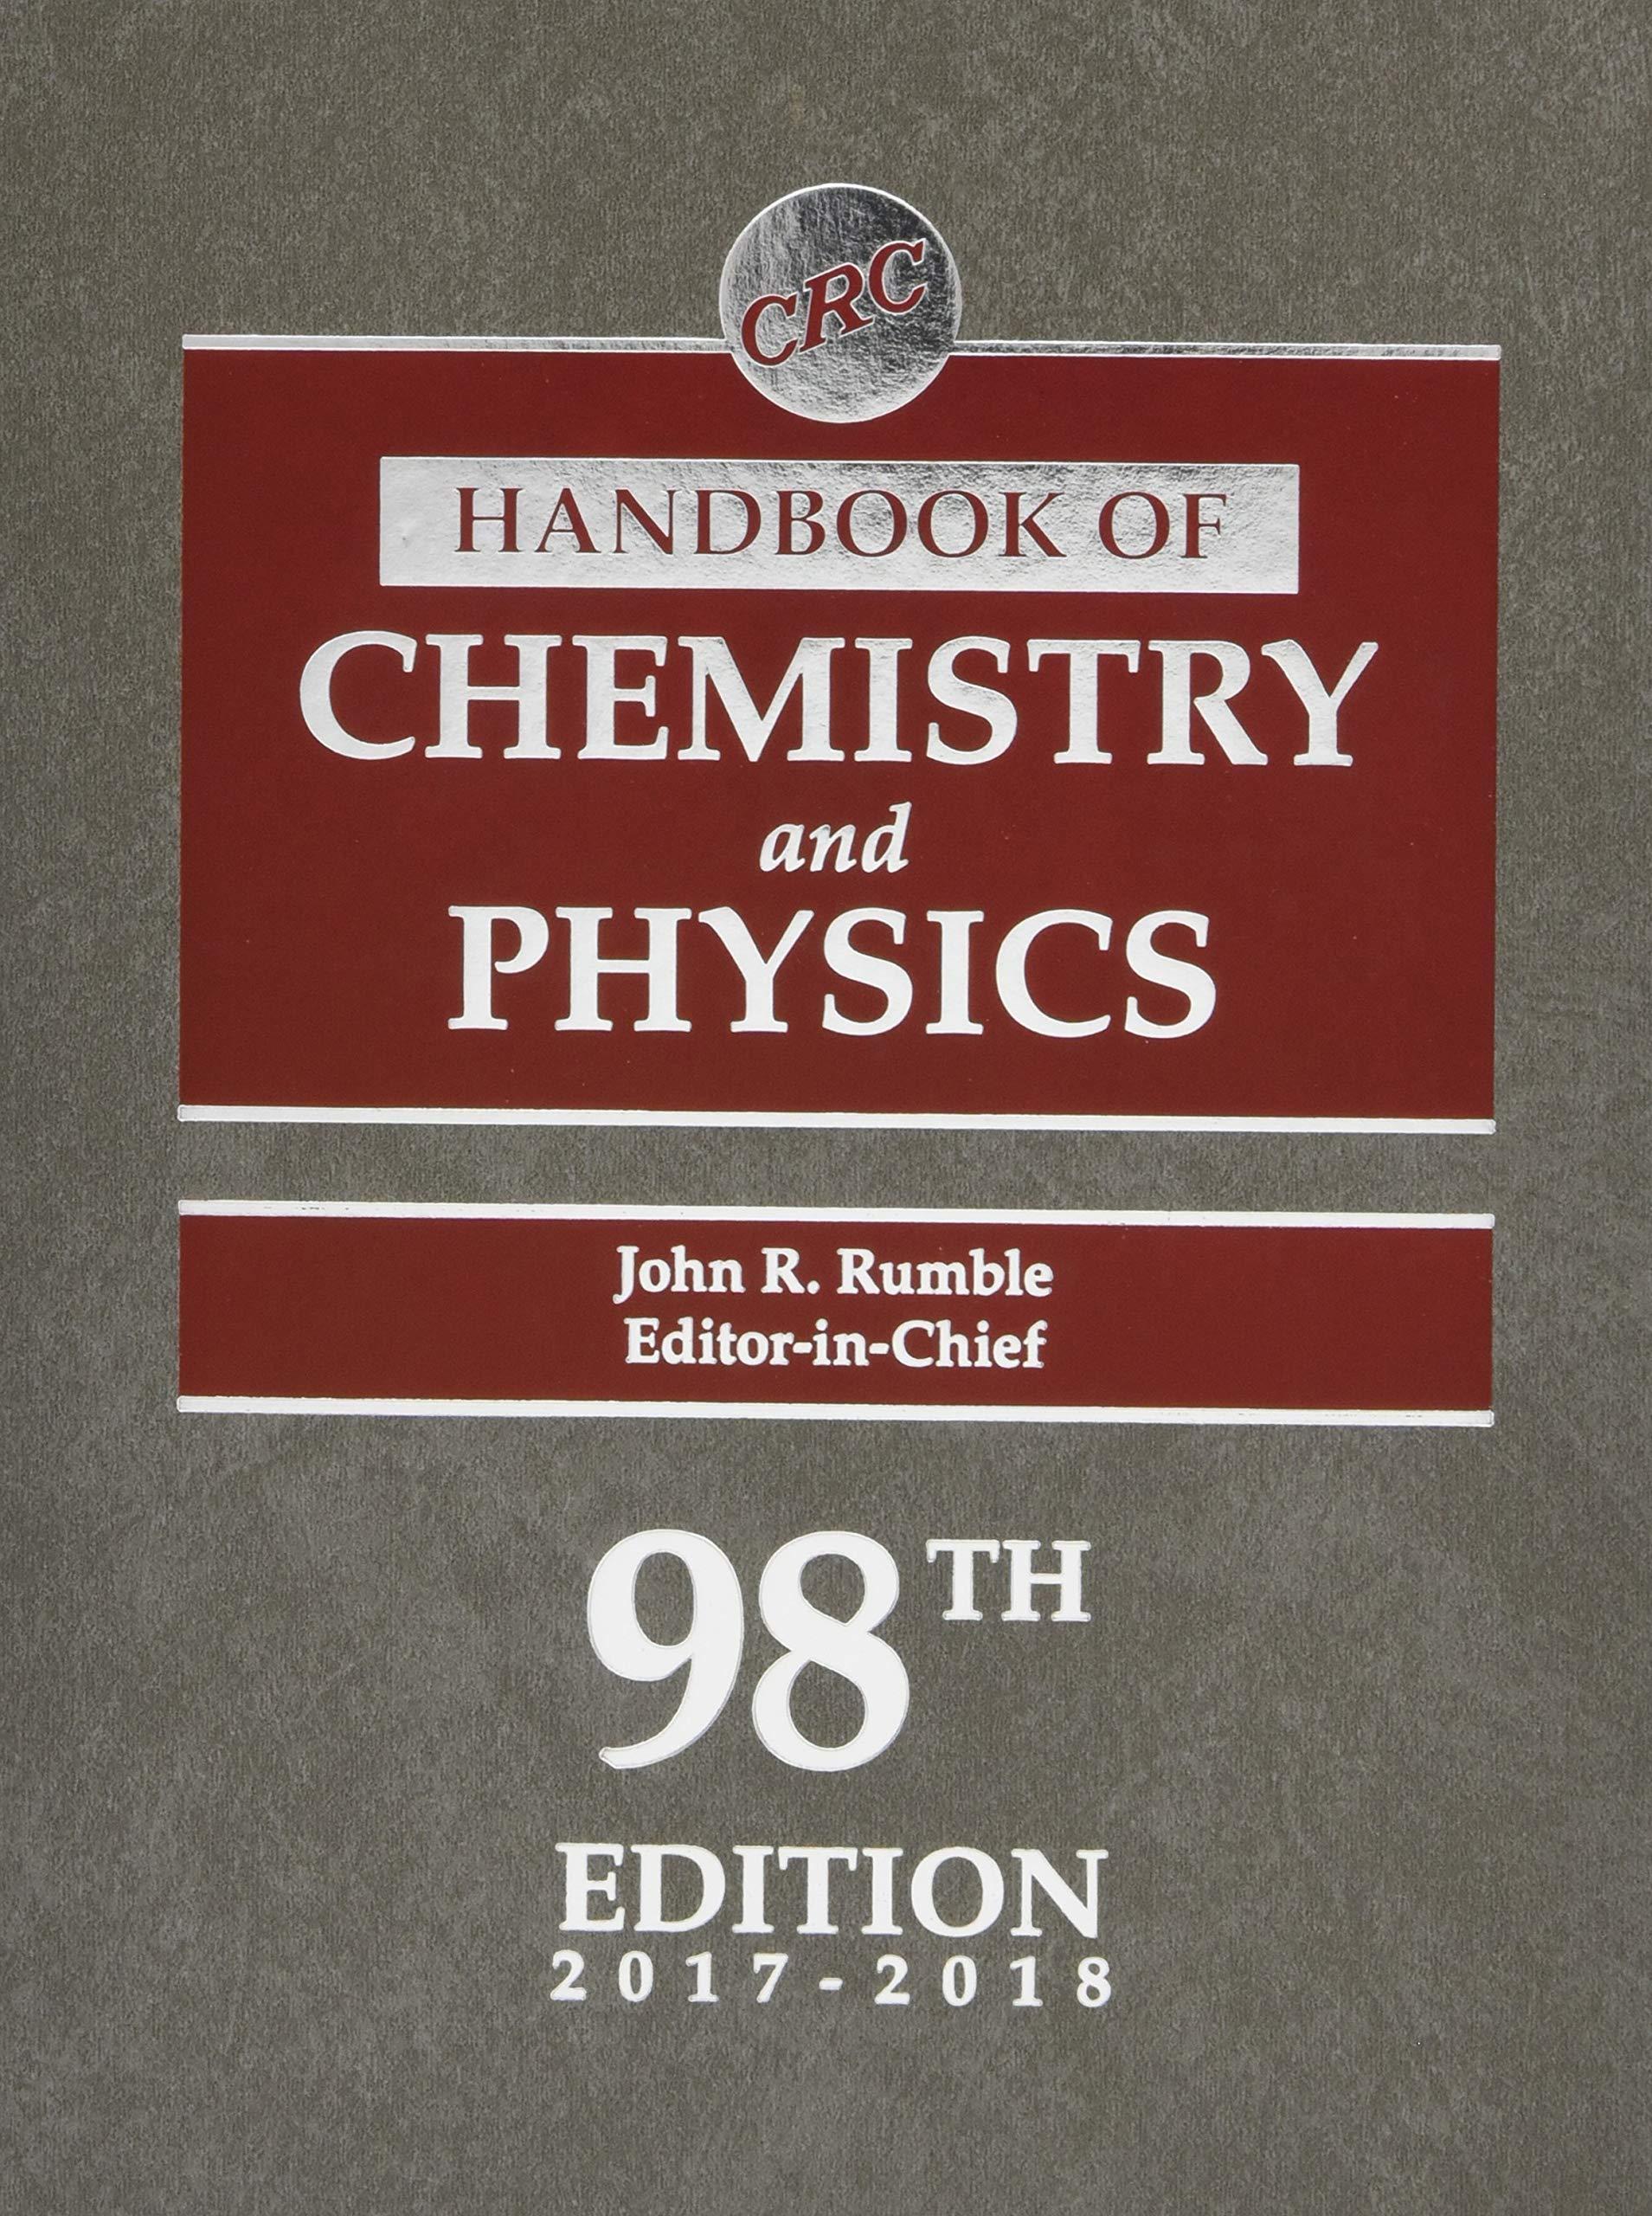 Crc Handbook Of Chemistry And Physics 98th Edition Amazon De John